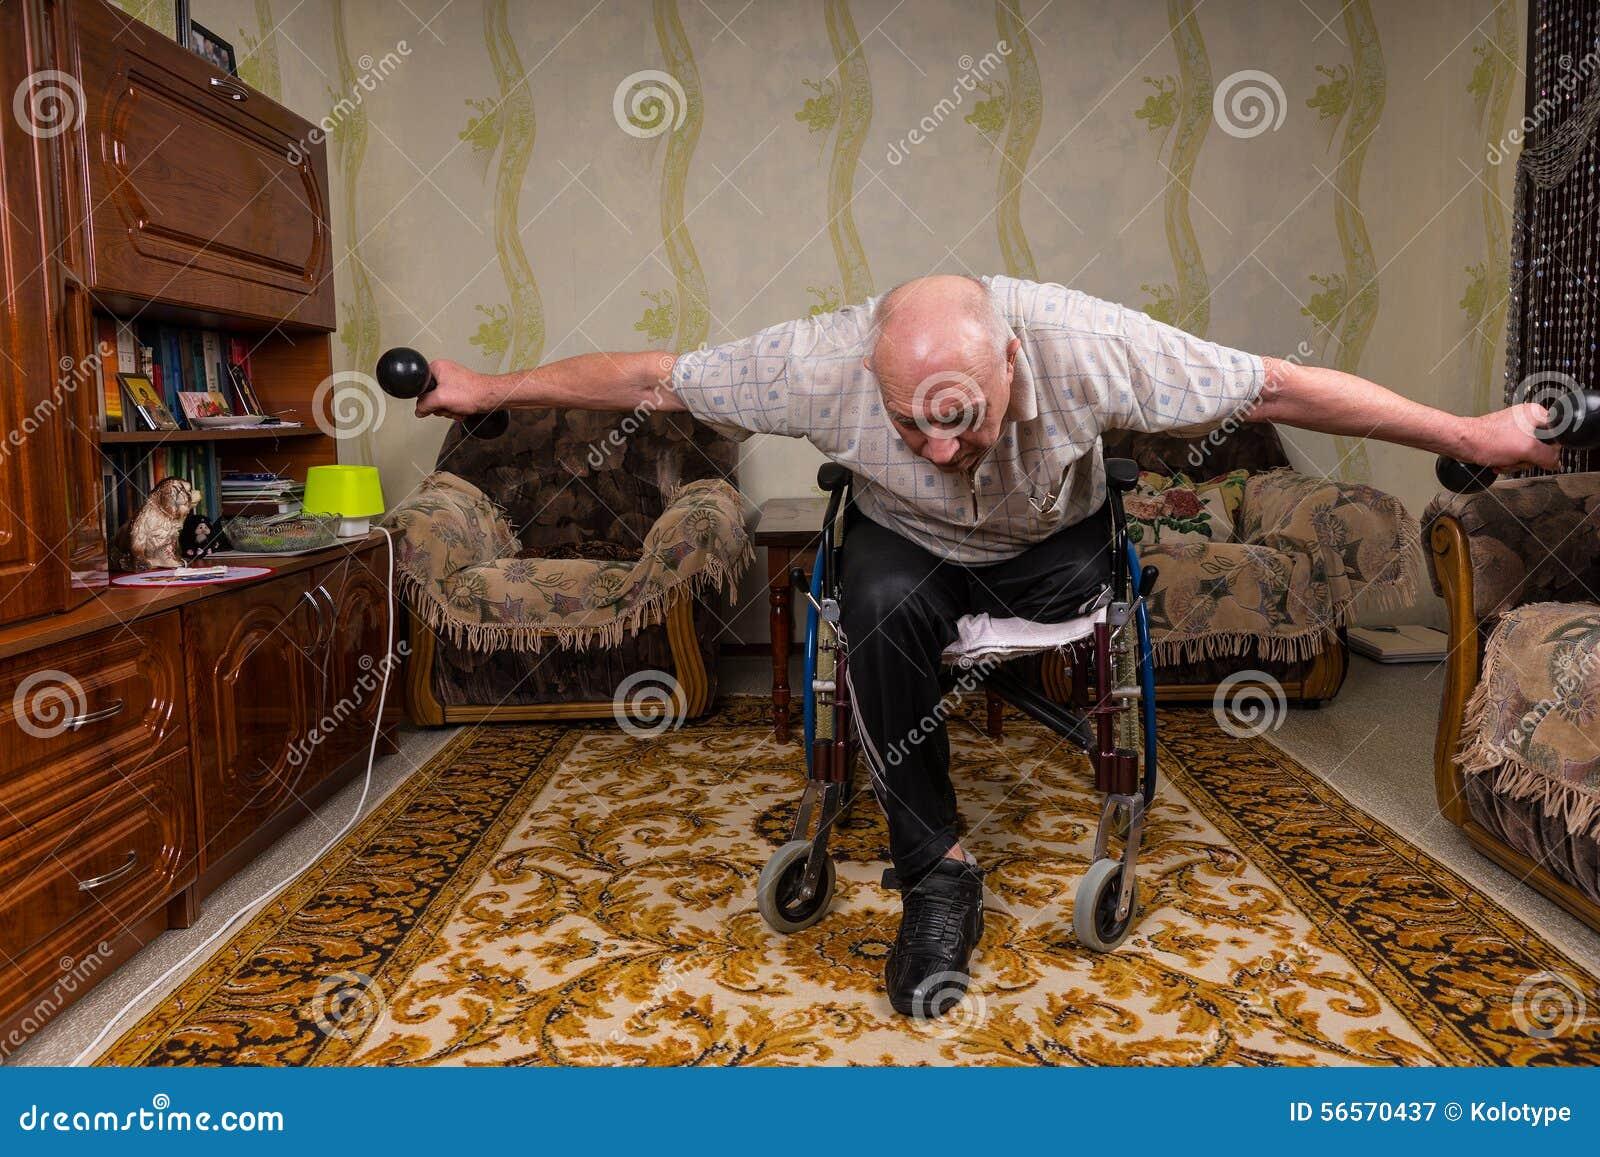 Download Άκυρος ηληκιωμένος που κλίνεται και που κάνει τις ασκήσεις Στοκ Εικόνα - εικόνα από βάρβων, και: 56570437